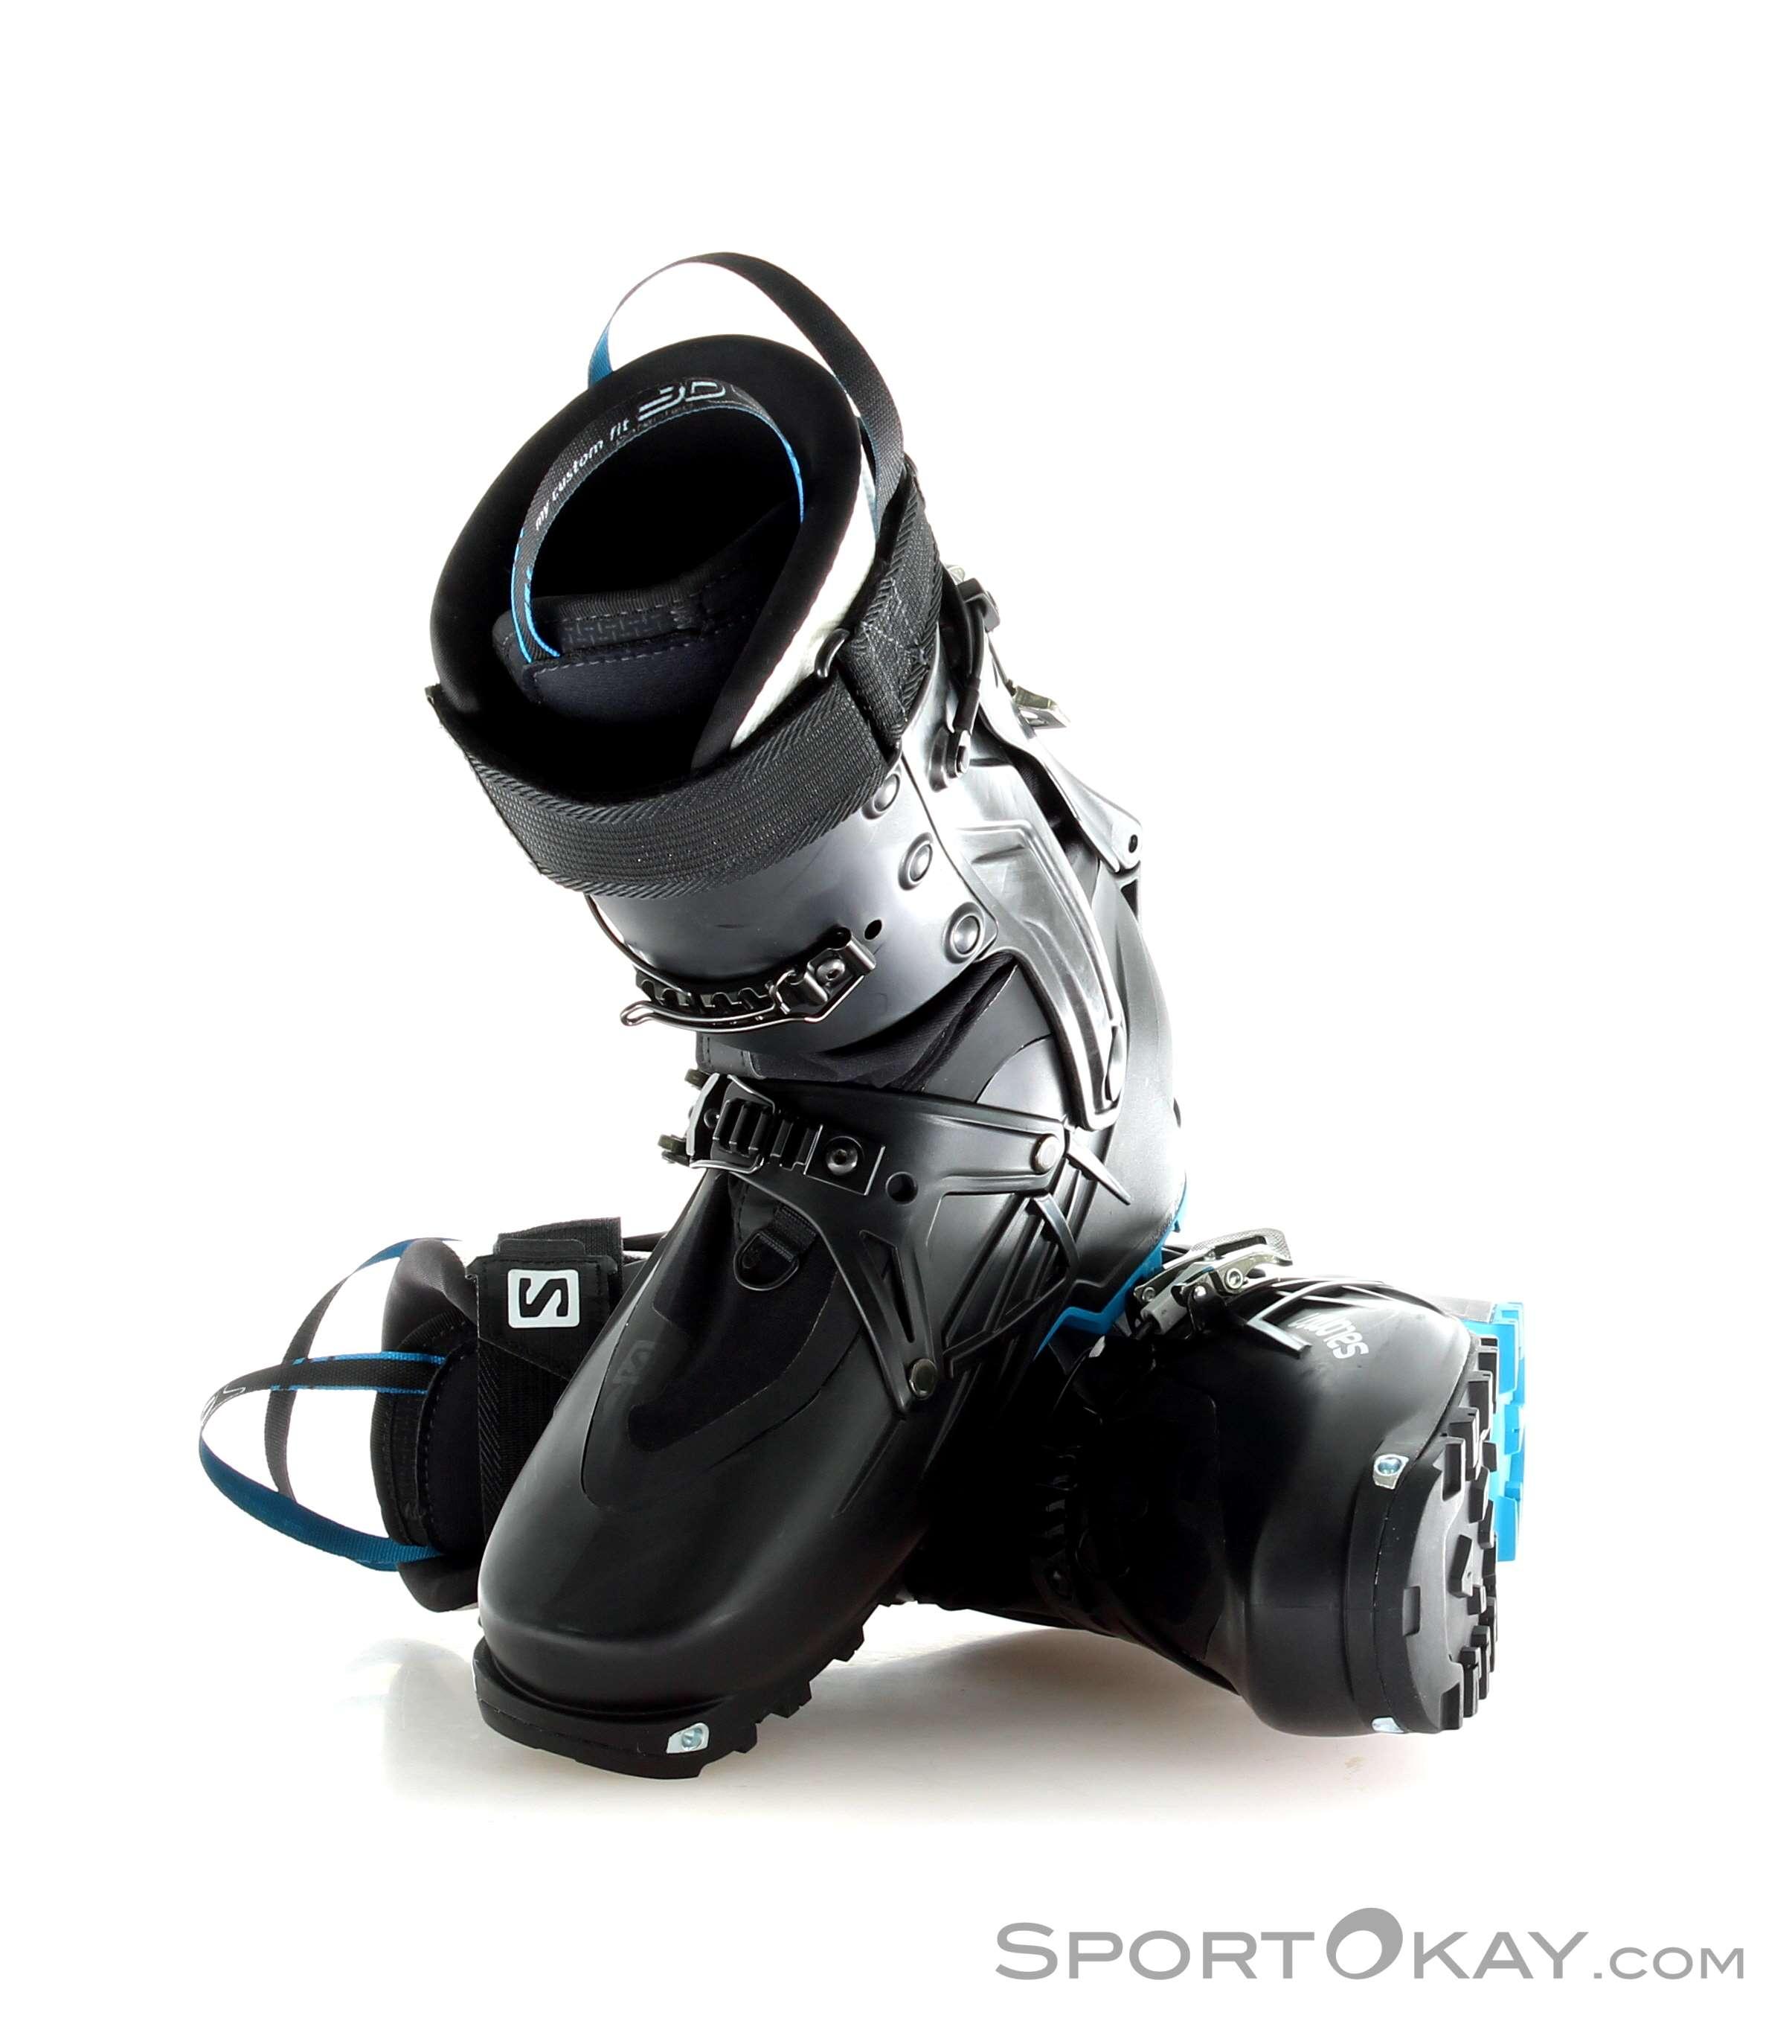 Salomon X Alp Explore Ski Touring Boots Ski Touring Boots